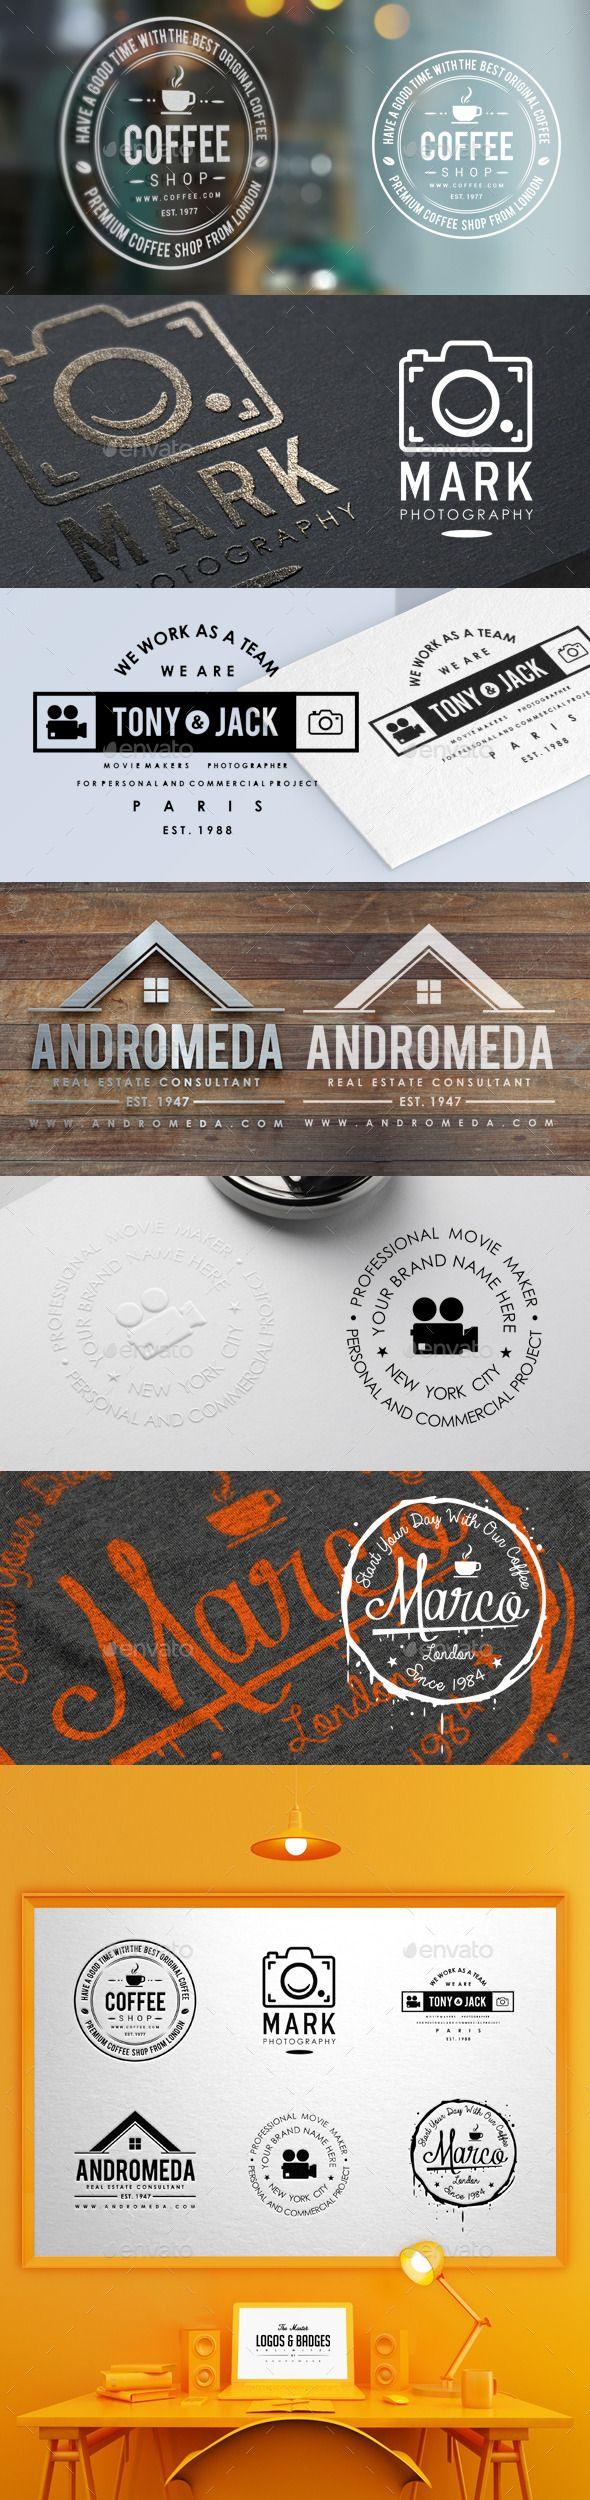 108 best Business Card Design images on Pinterest | Graph design ...